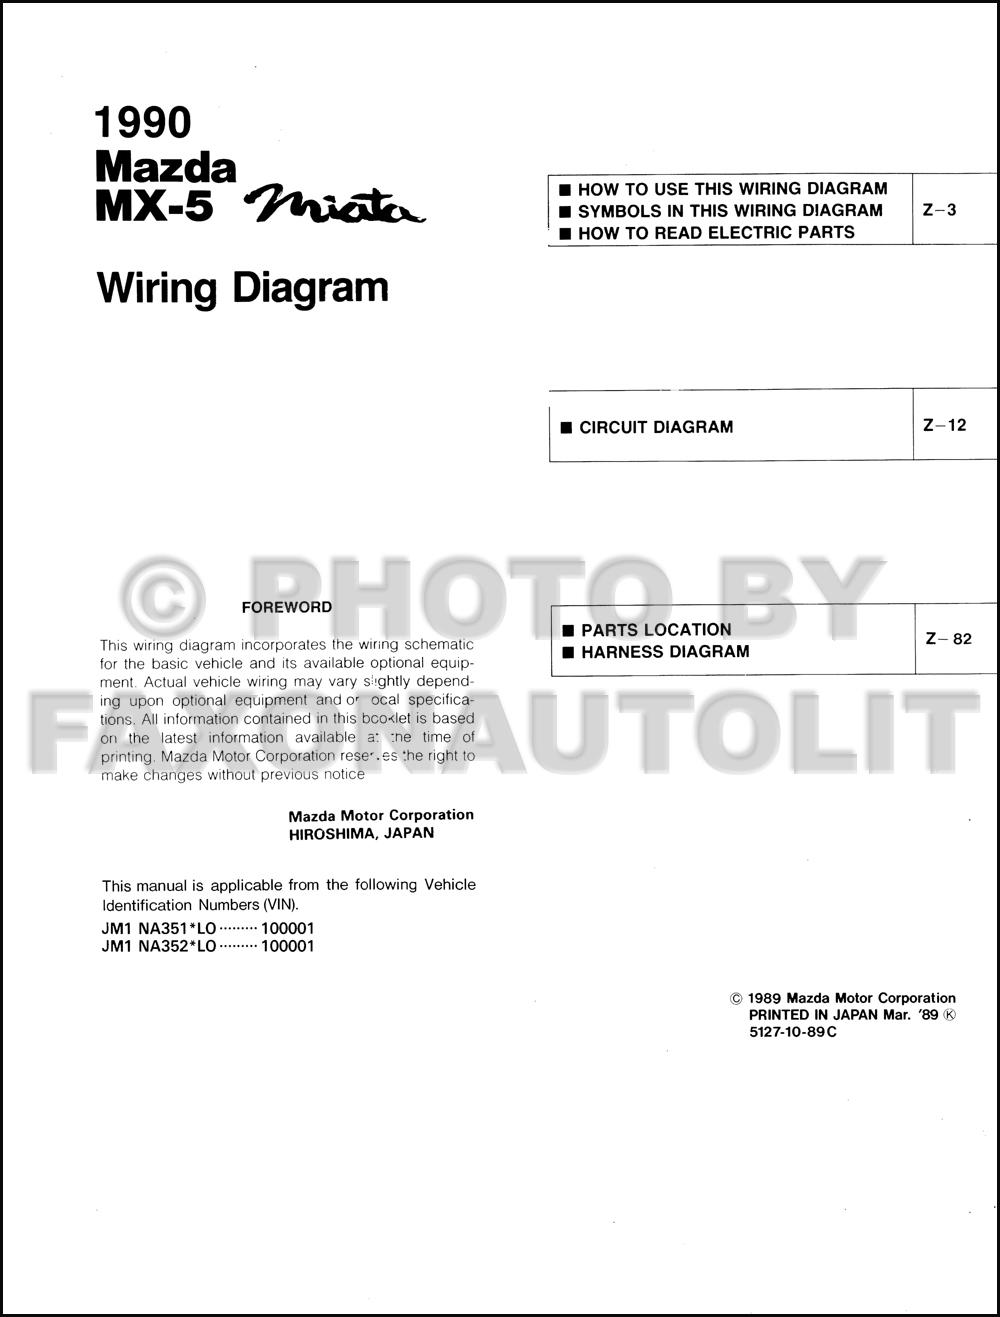 199mazda Mx 5 Miata Wiring Diagram Original Transmission Cars